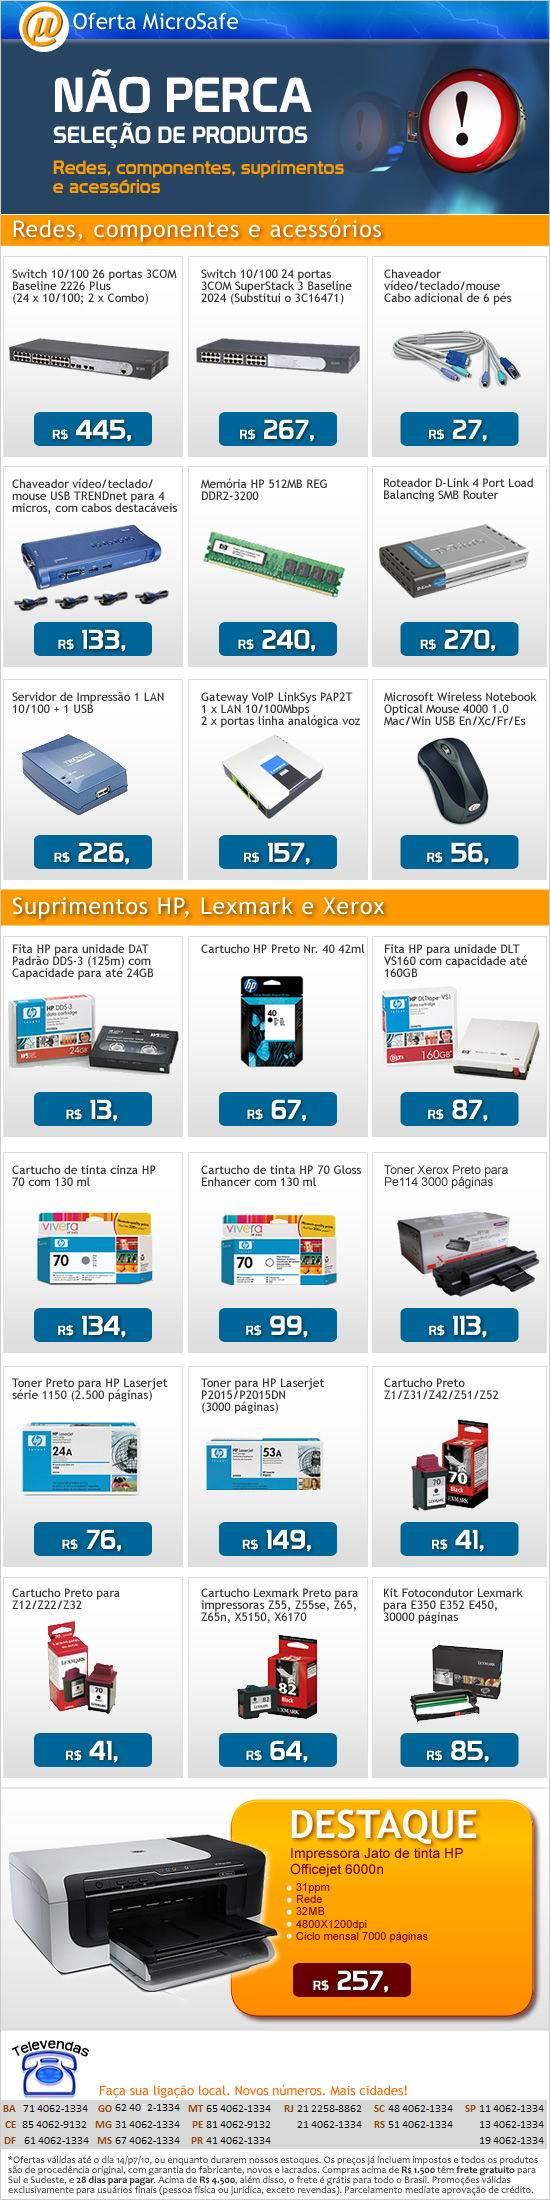 Impressora HP Officejet 6000n apenas 257,